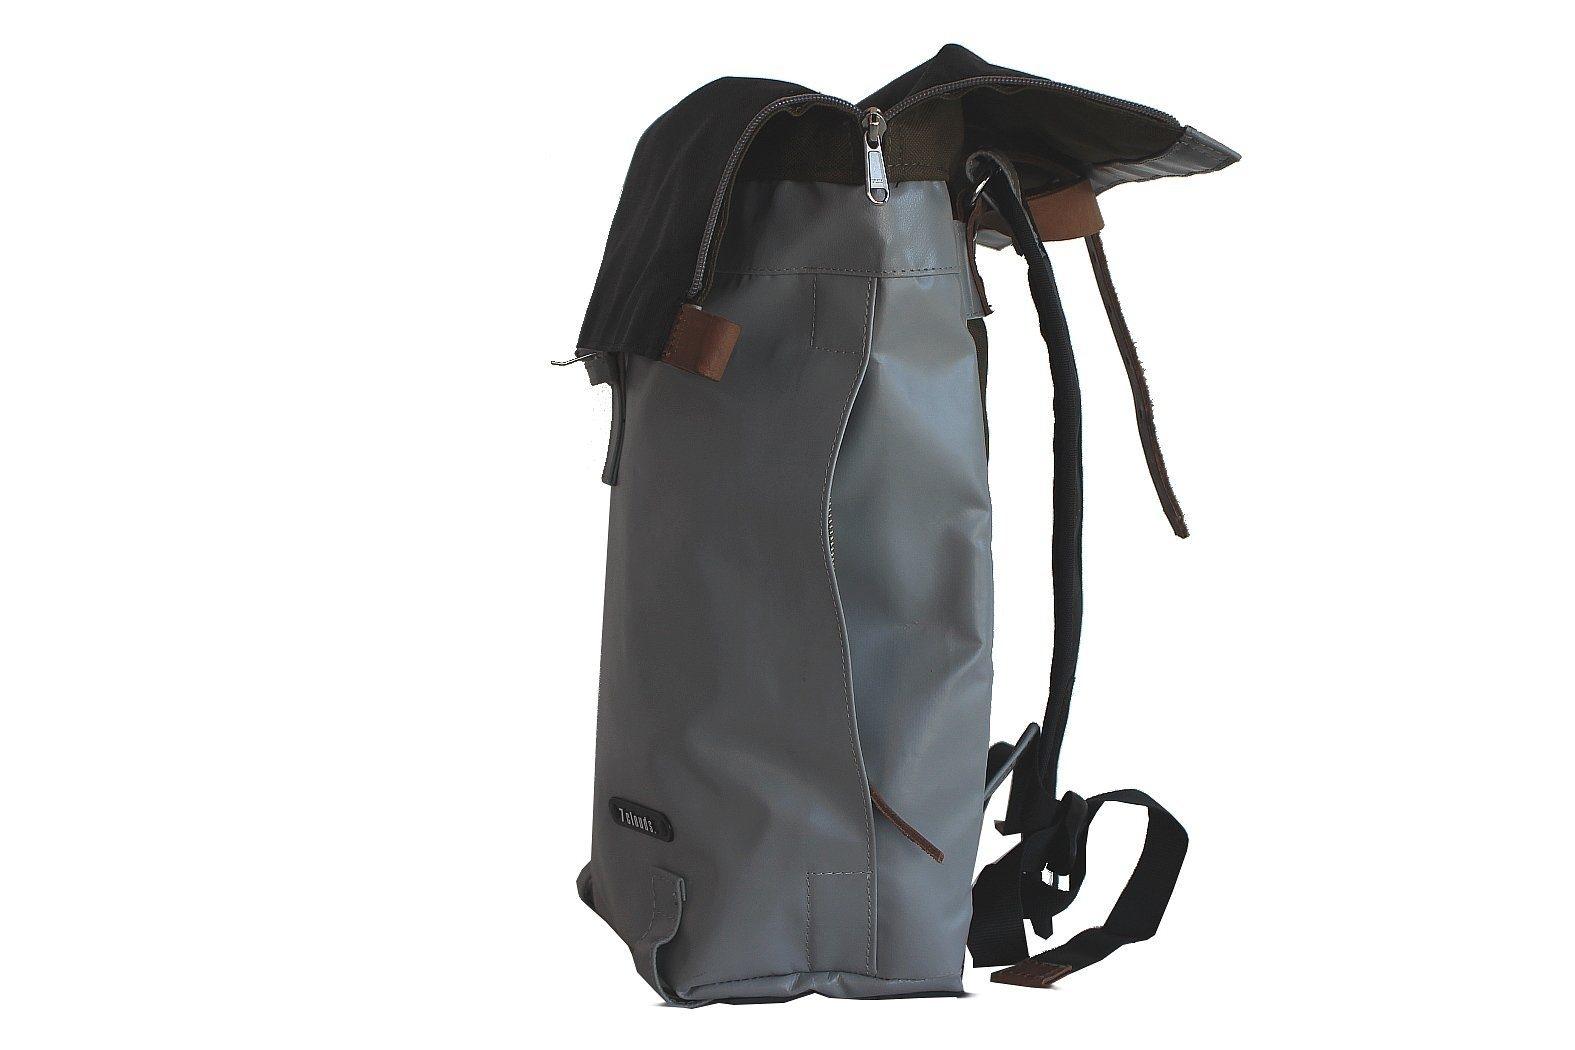 7clouds cityrucksack dwars 72 Rucksack aus Persenning (Bootabdeckungsplane) csb47